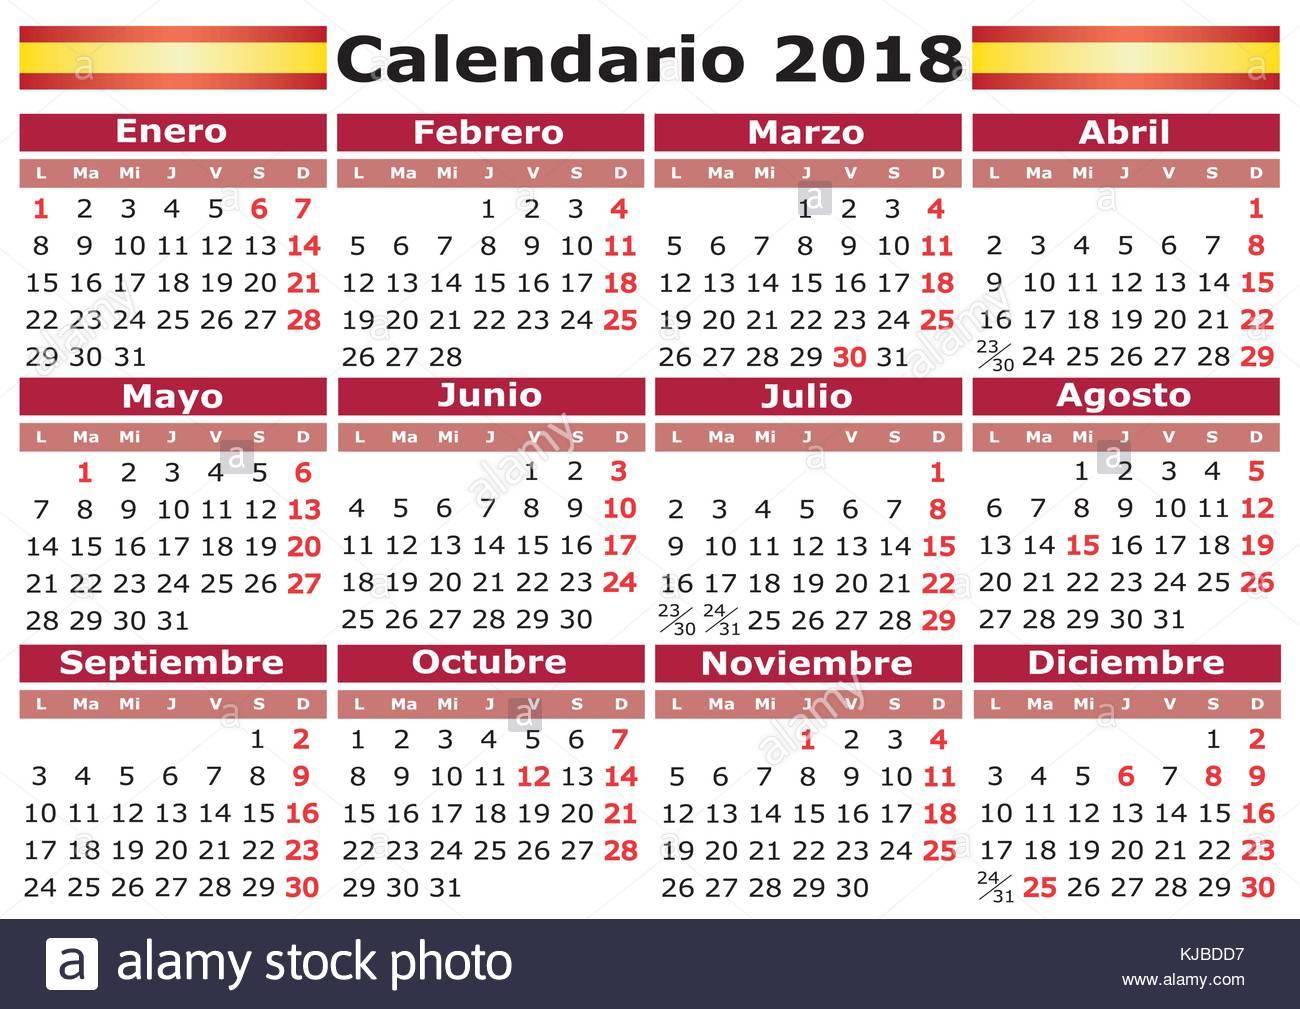 Spanish Calendar For March Learn Spanish Online At Studyspanish Calendario 2018 Stock Photos And Calendario 2018 Stock